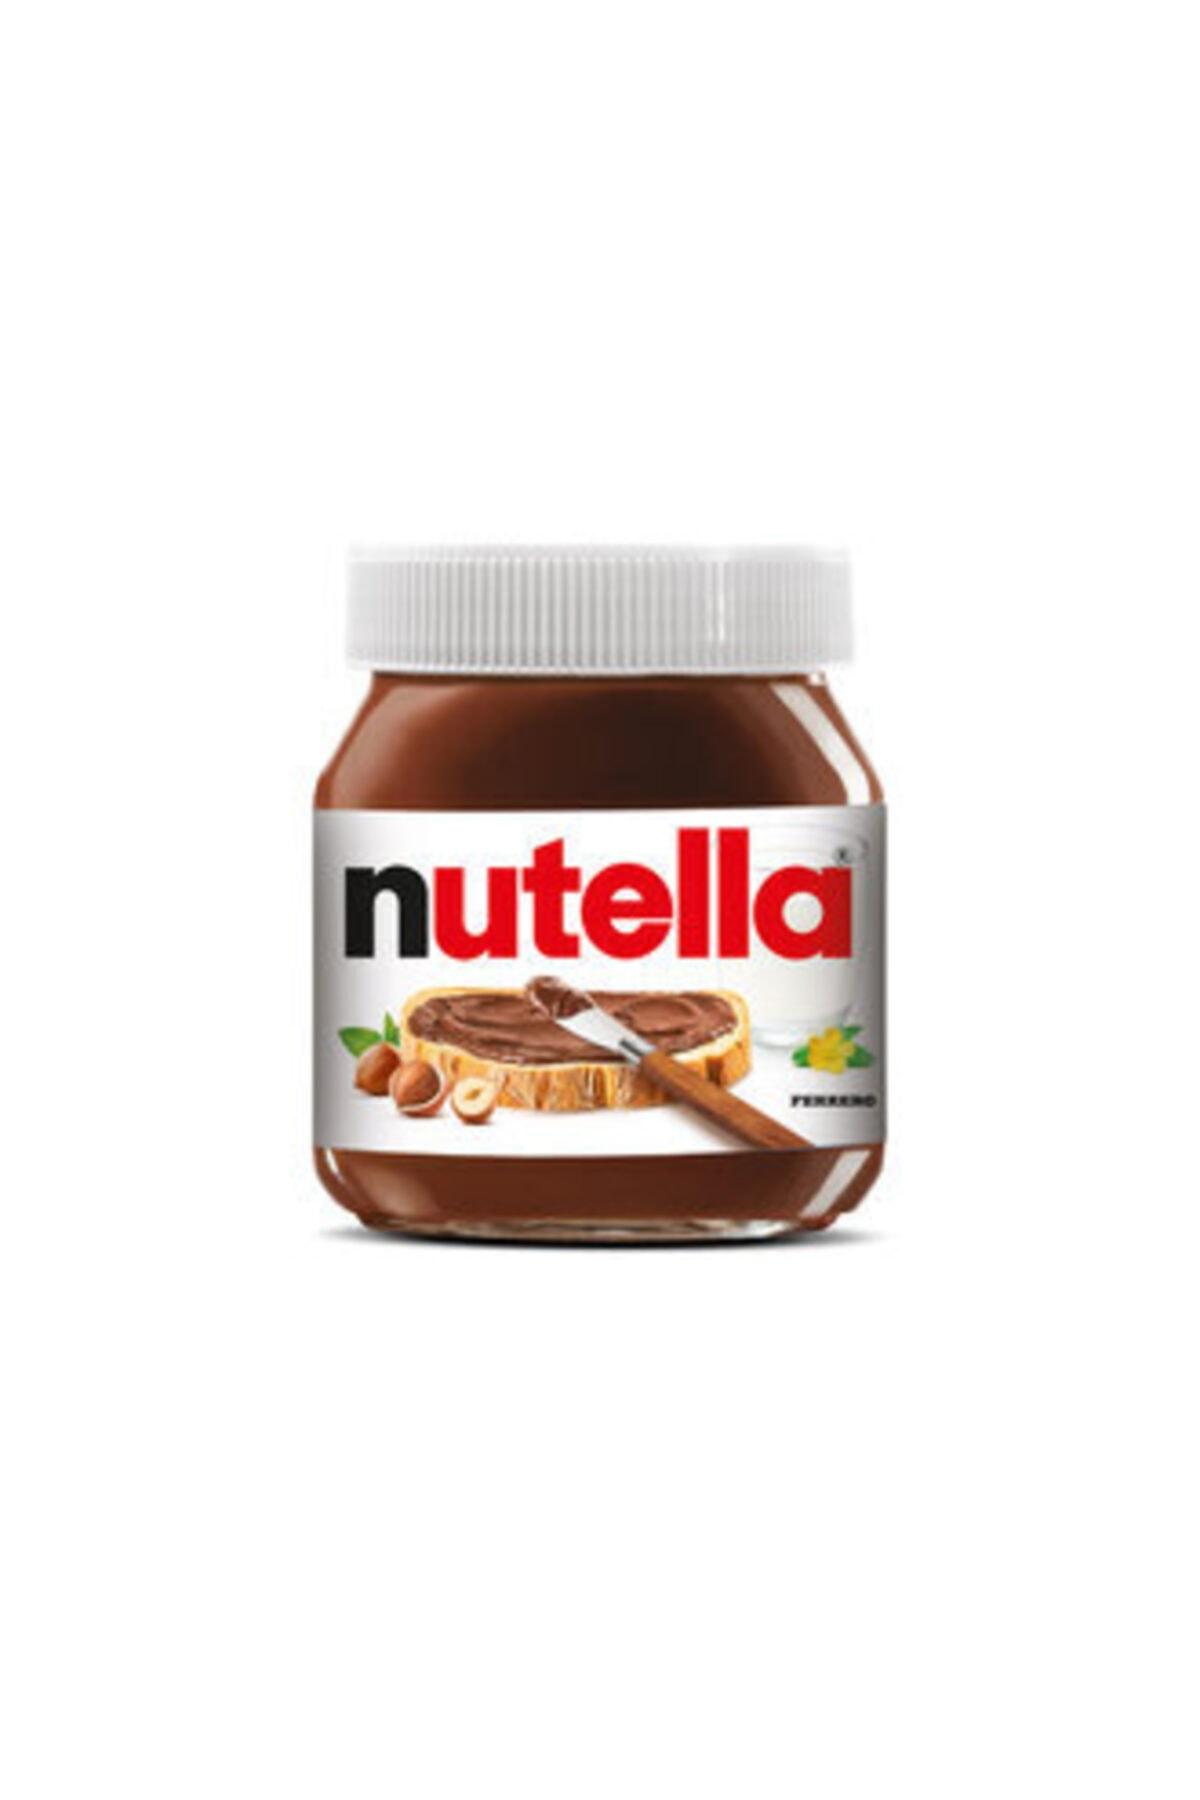 Nutella Kakaolu Fındık Krem Çikolata 400 g 1